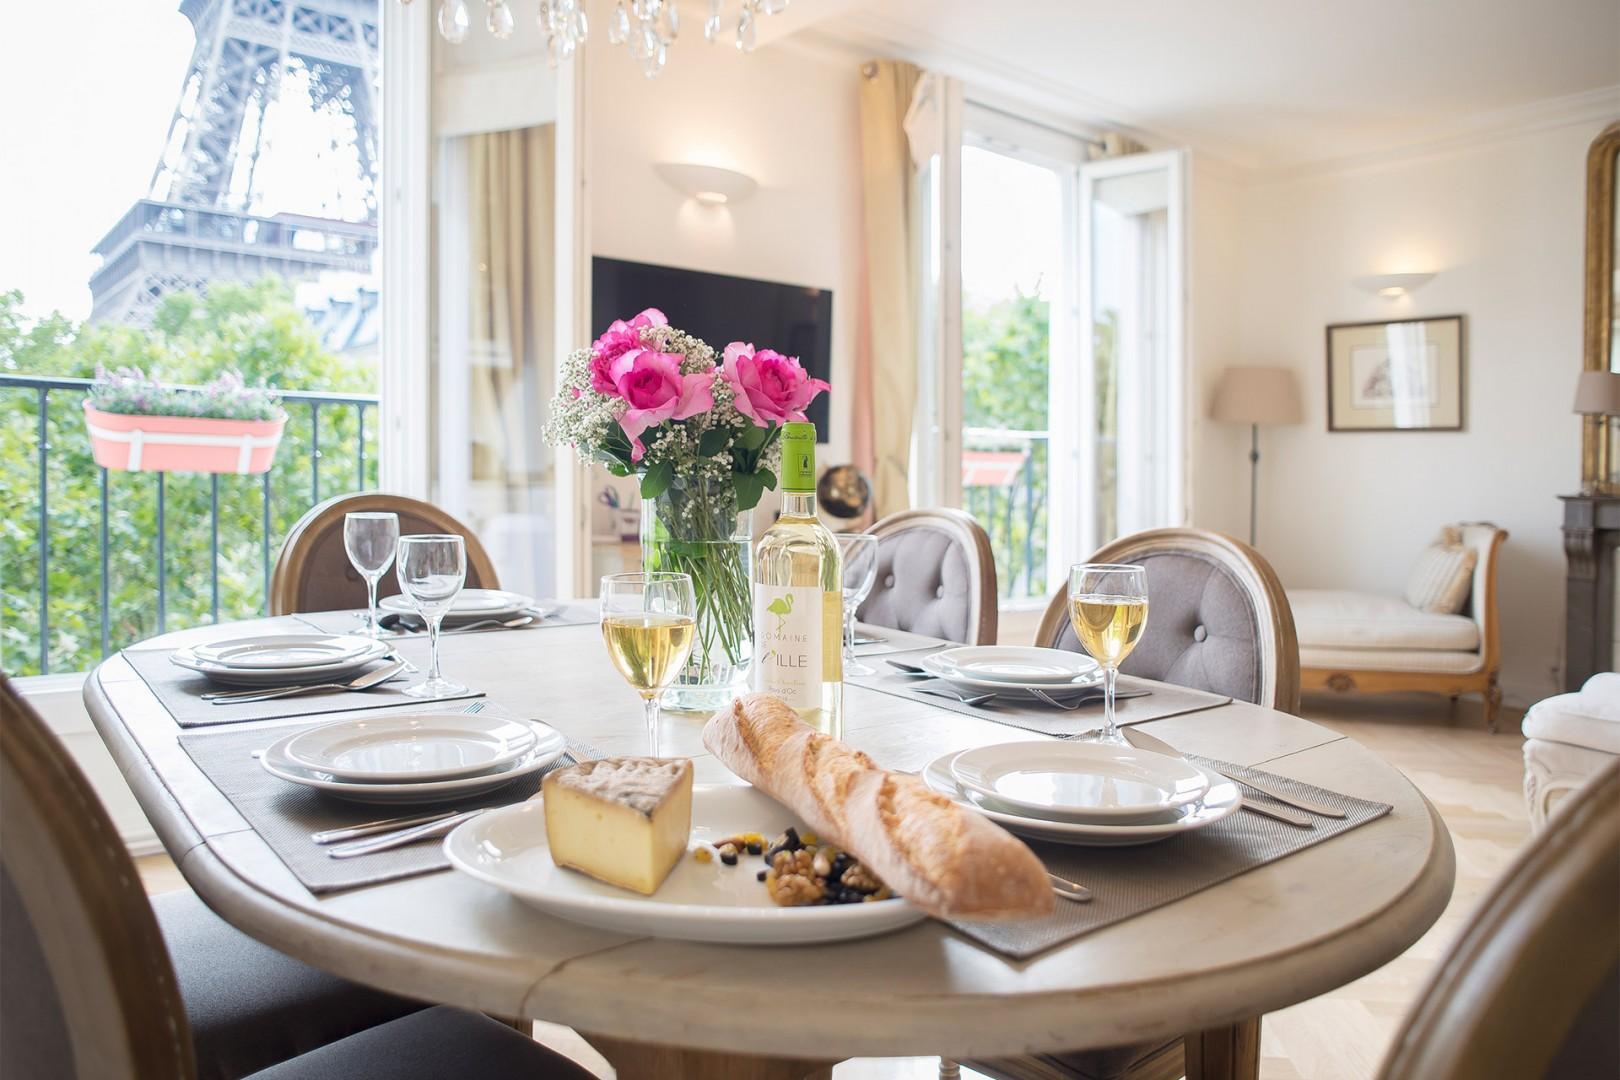 This Paris apartment definitely has the 'wow' factor!